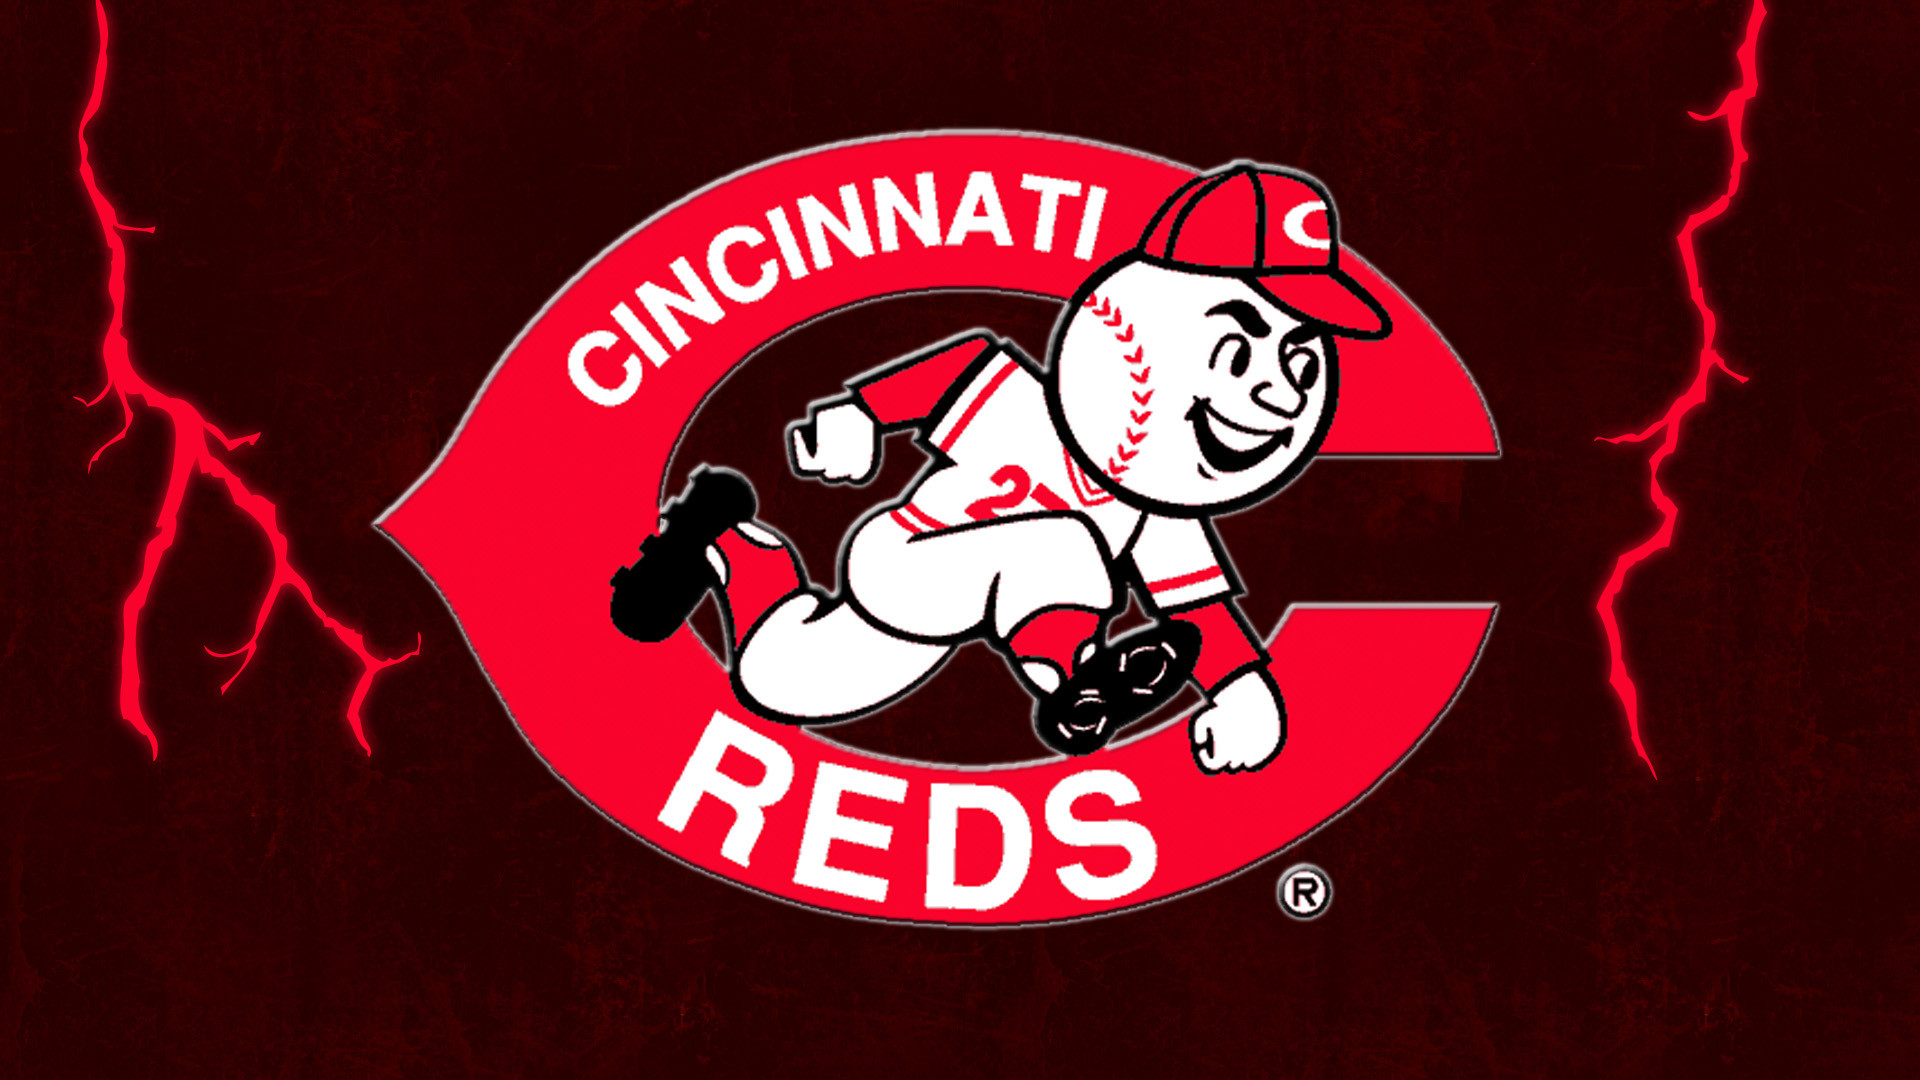 CINCINNATI REDS mlb baseball (7) wallpaper     229502 .